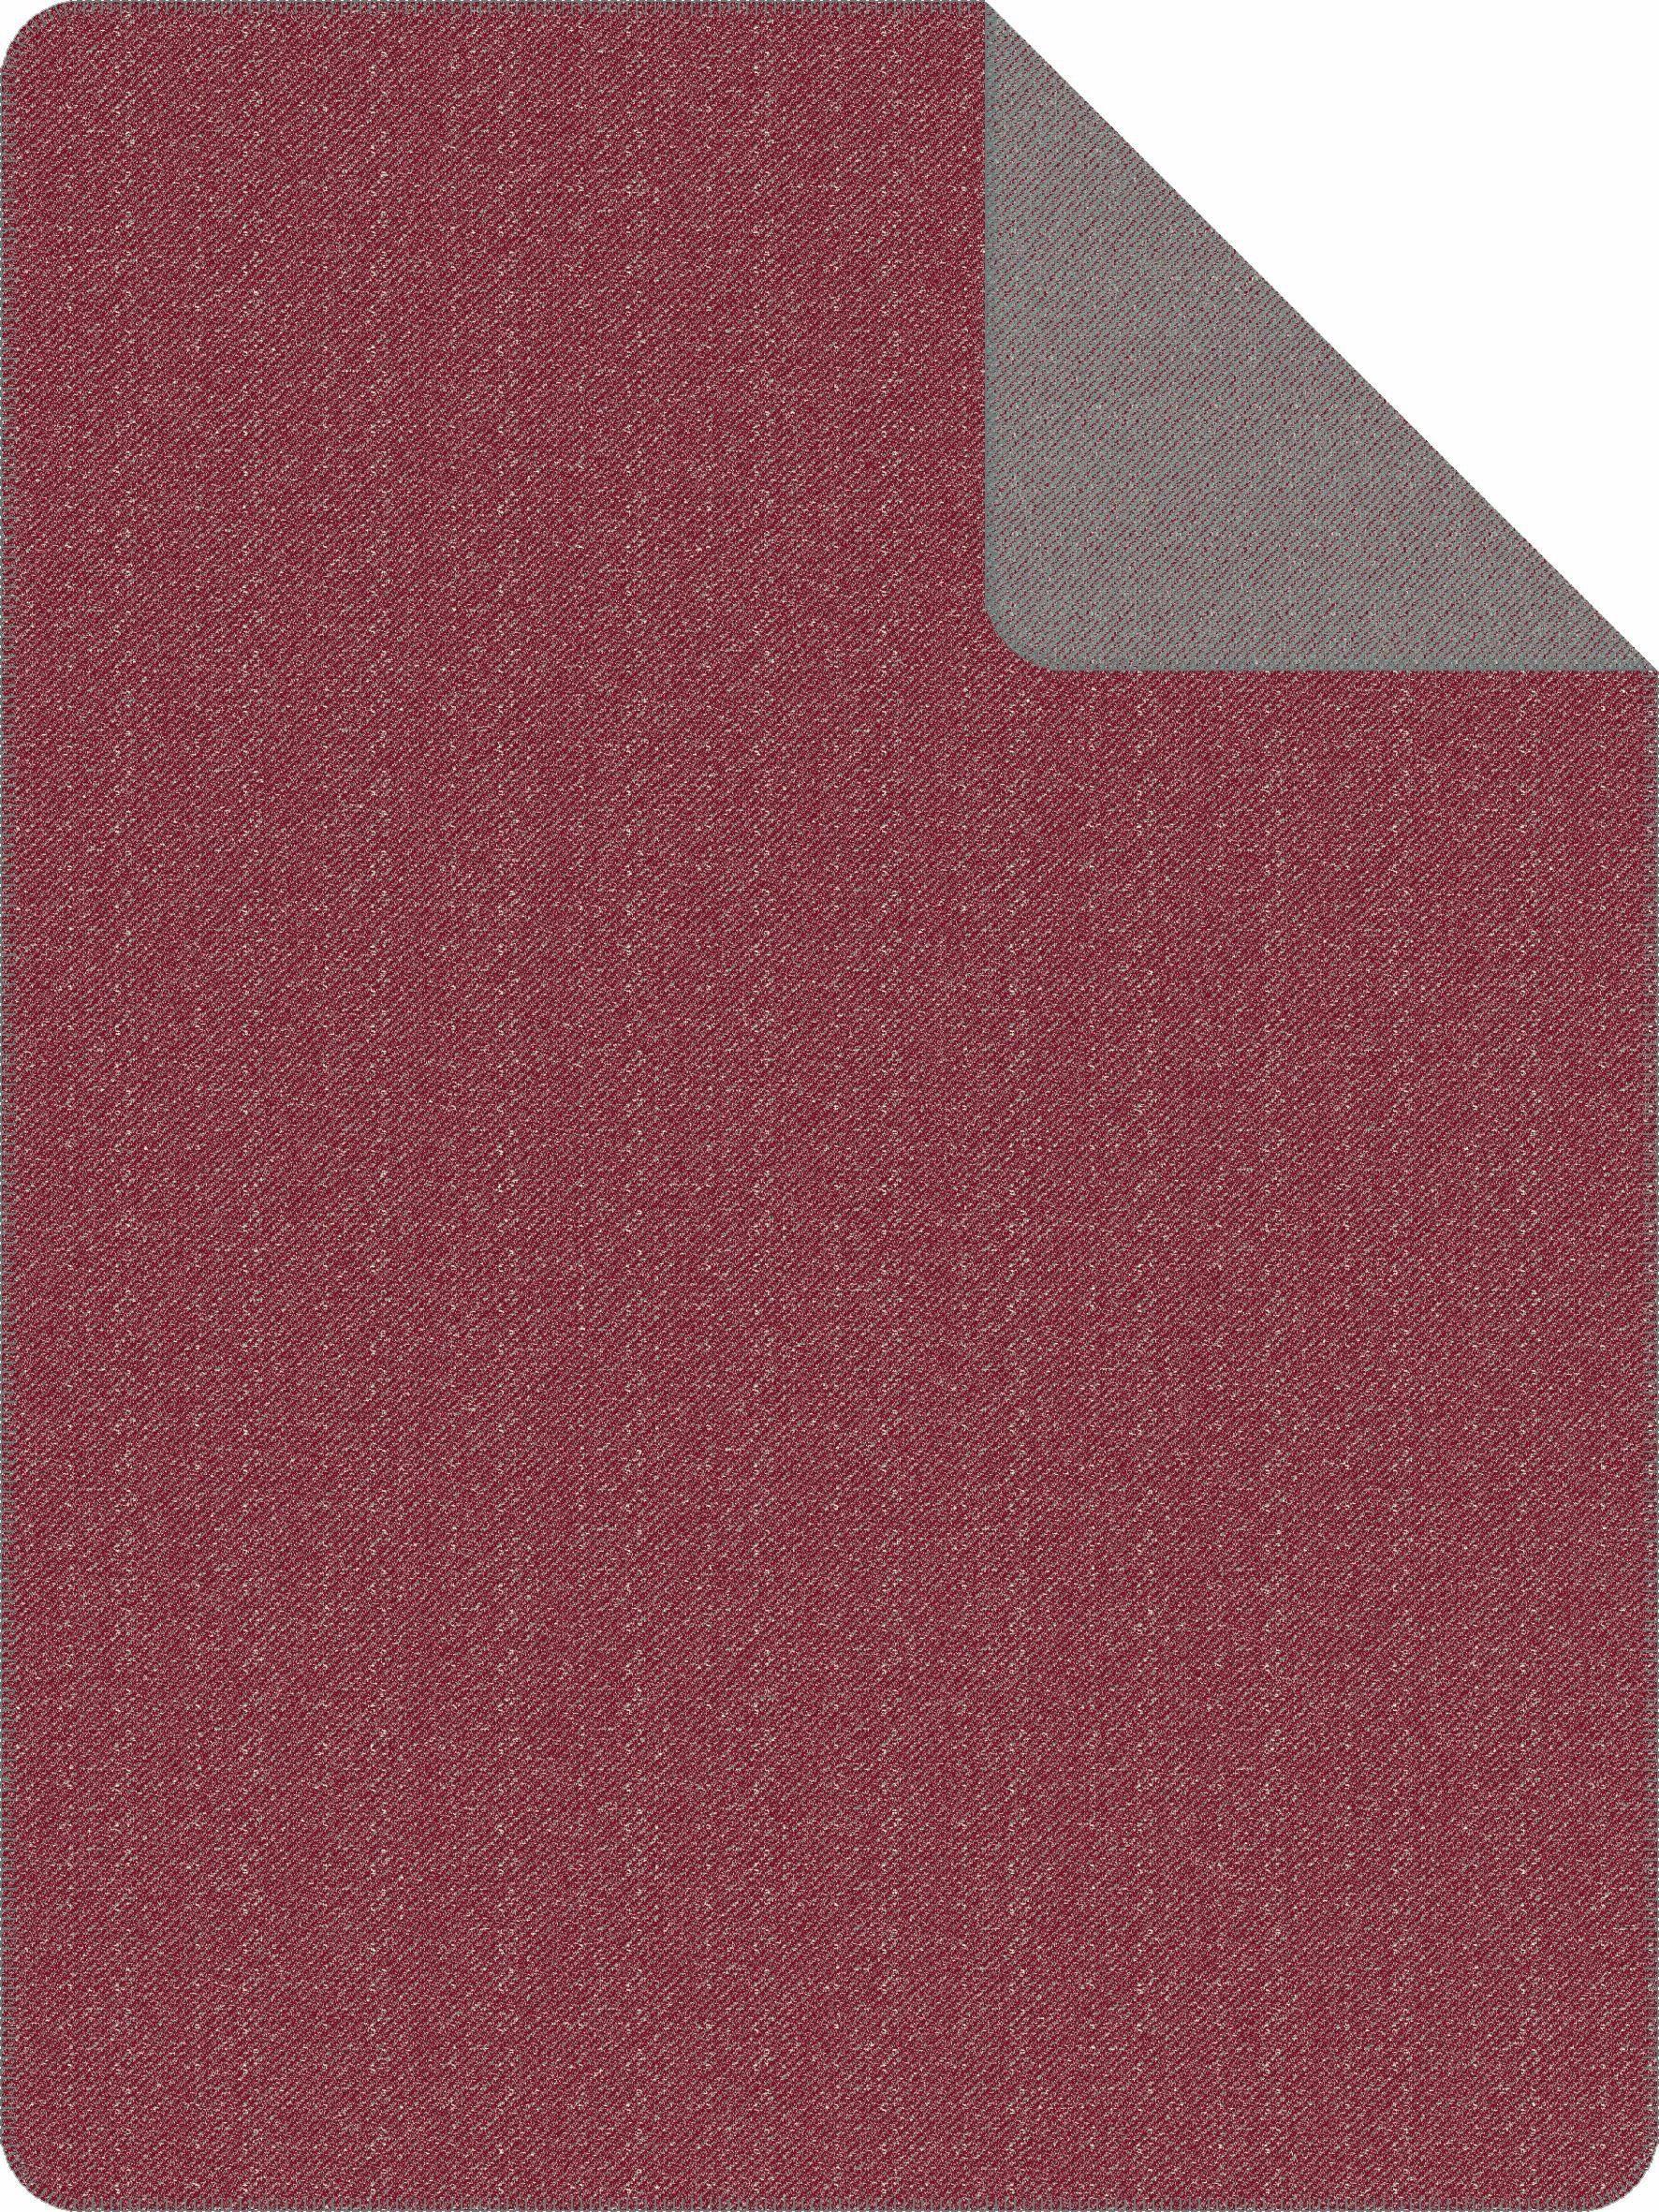 Wohndecke »Haag«, s.Oliver RED LABEL, in Doubleface Optik